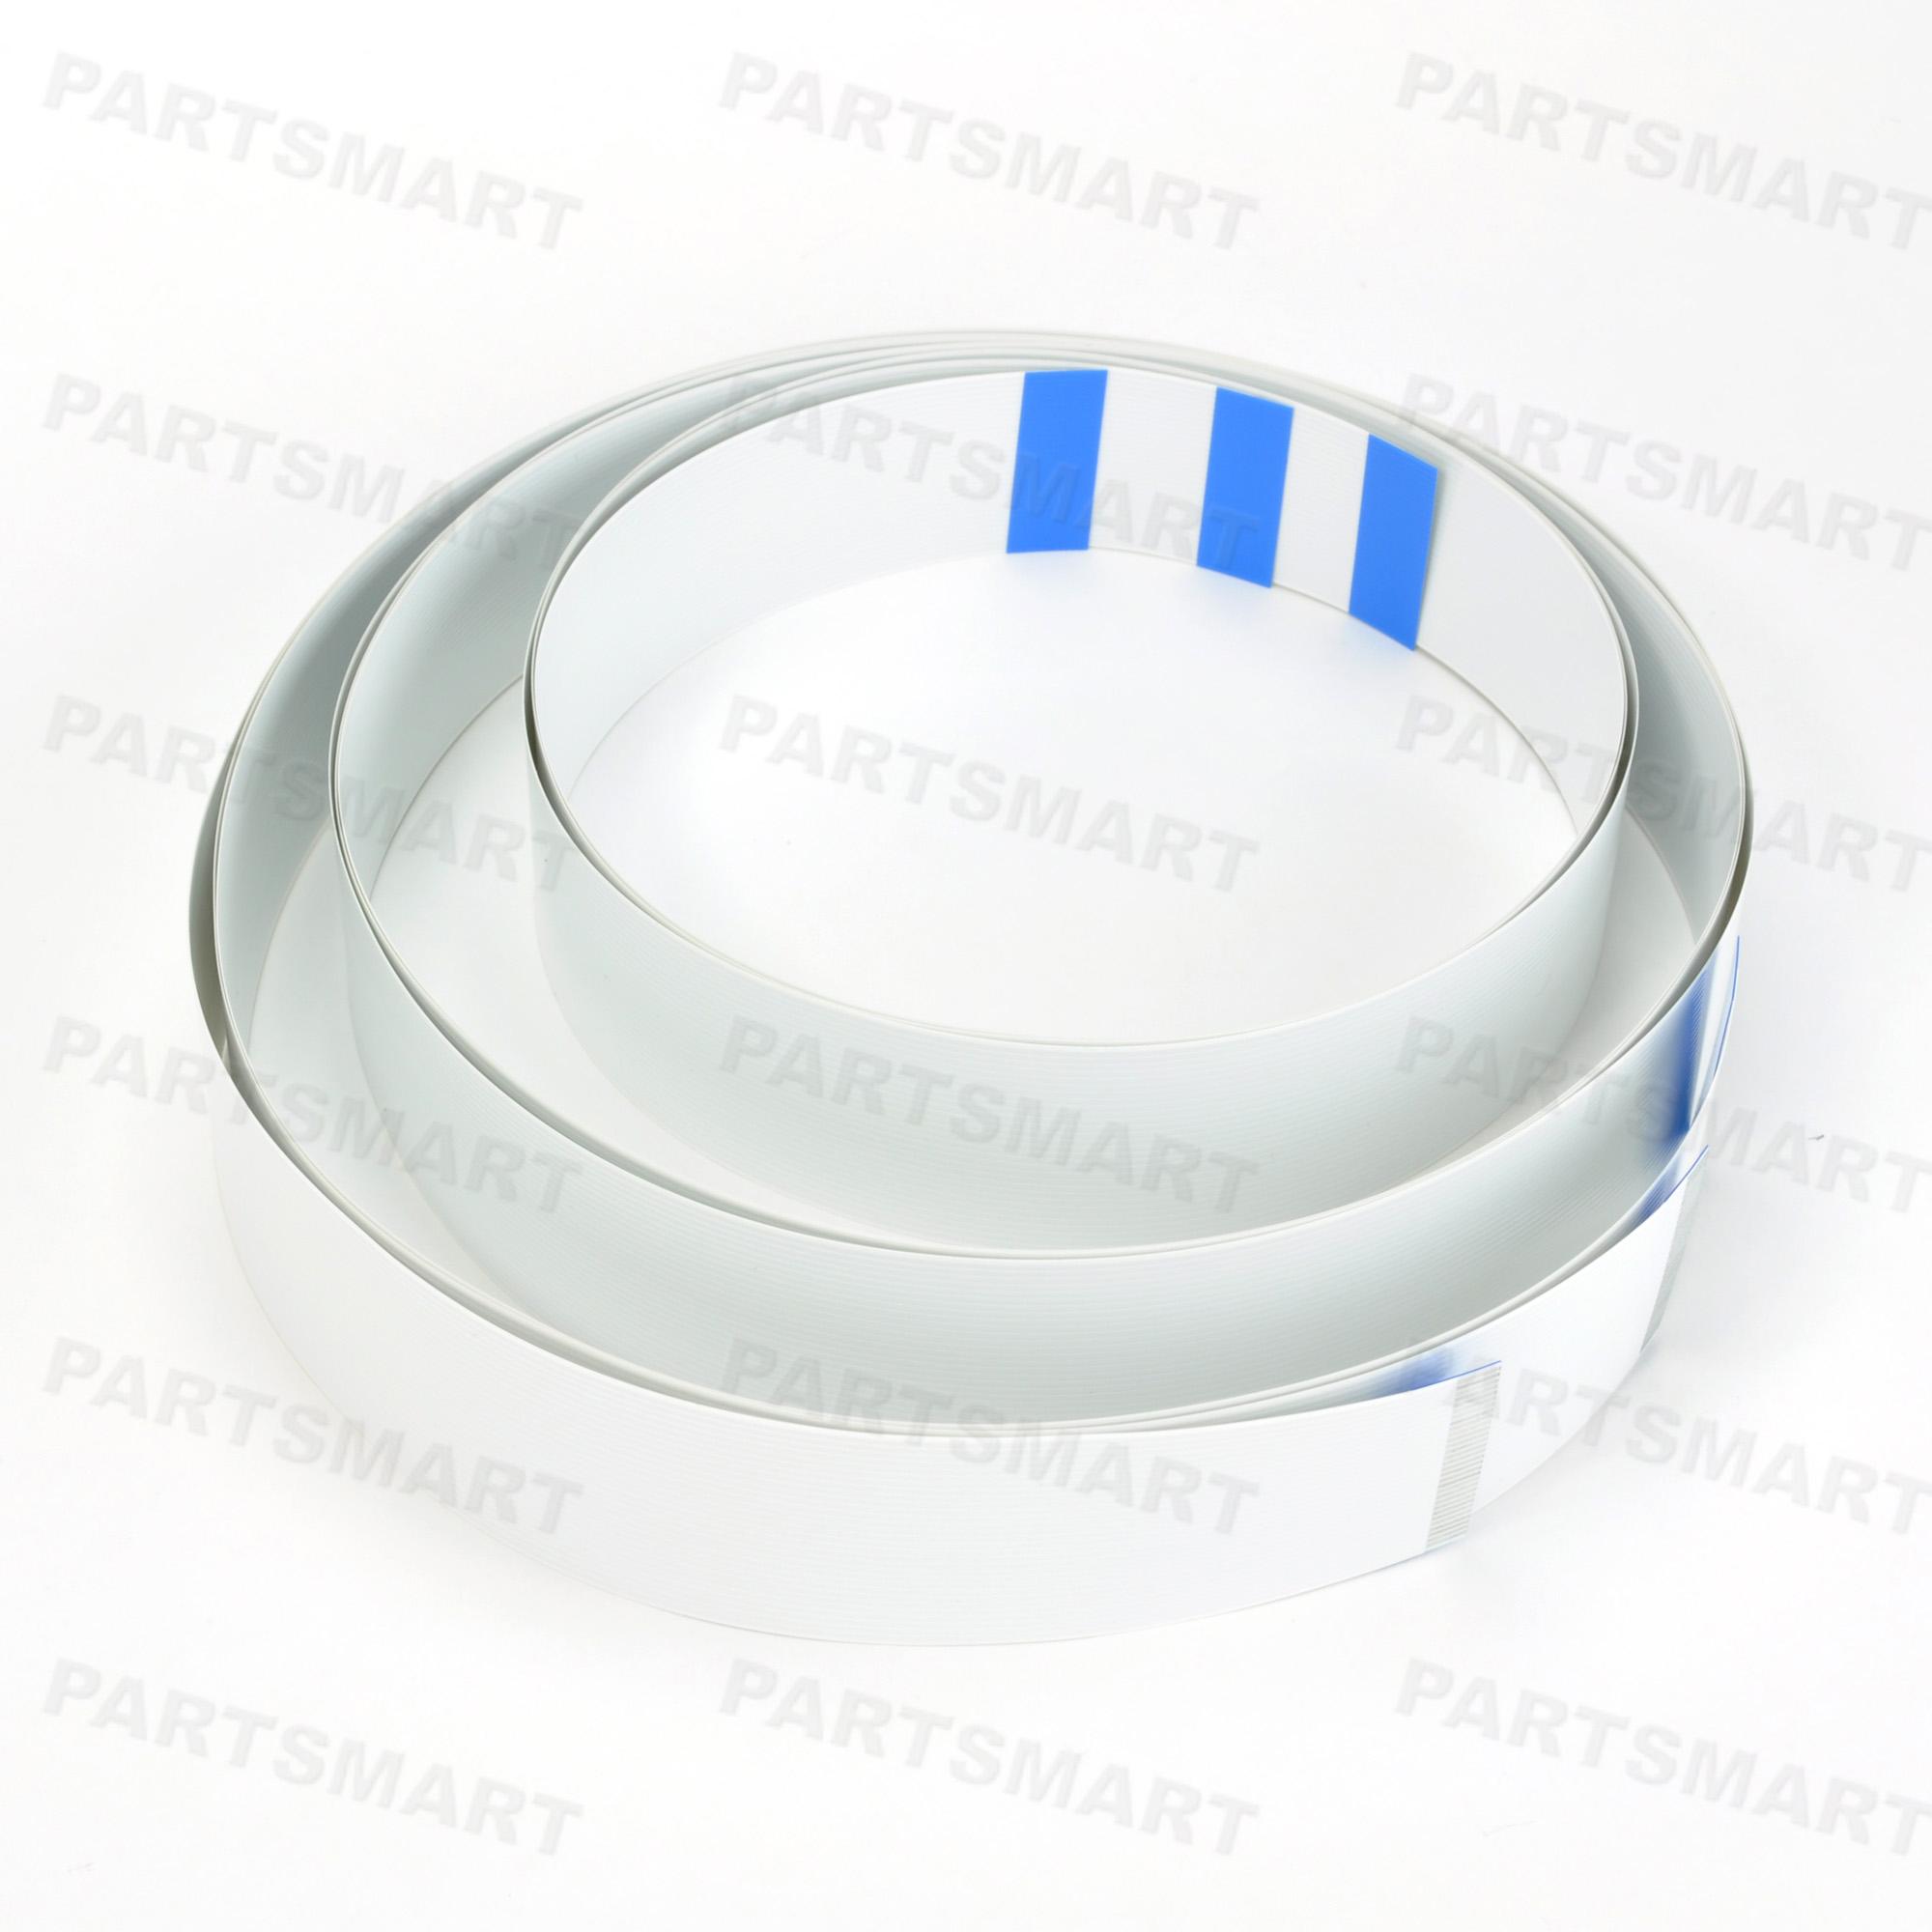 Trailing Cable For Designjet 110 Plotter Parts Partsmart